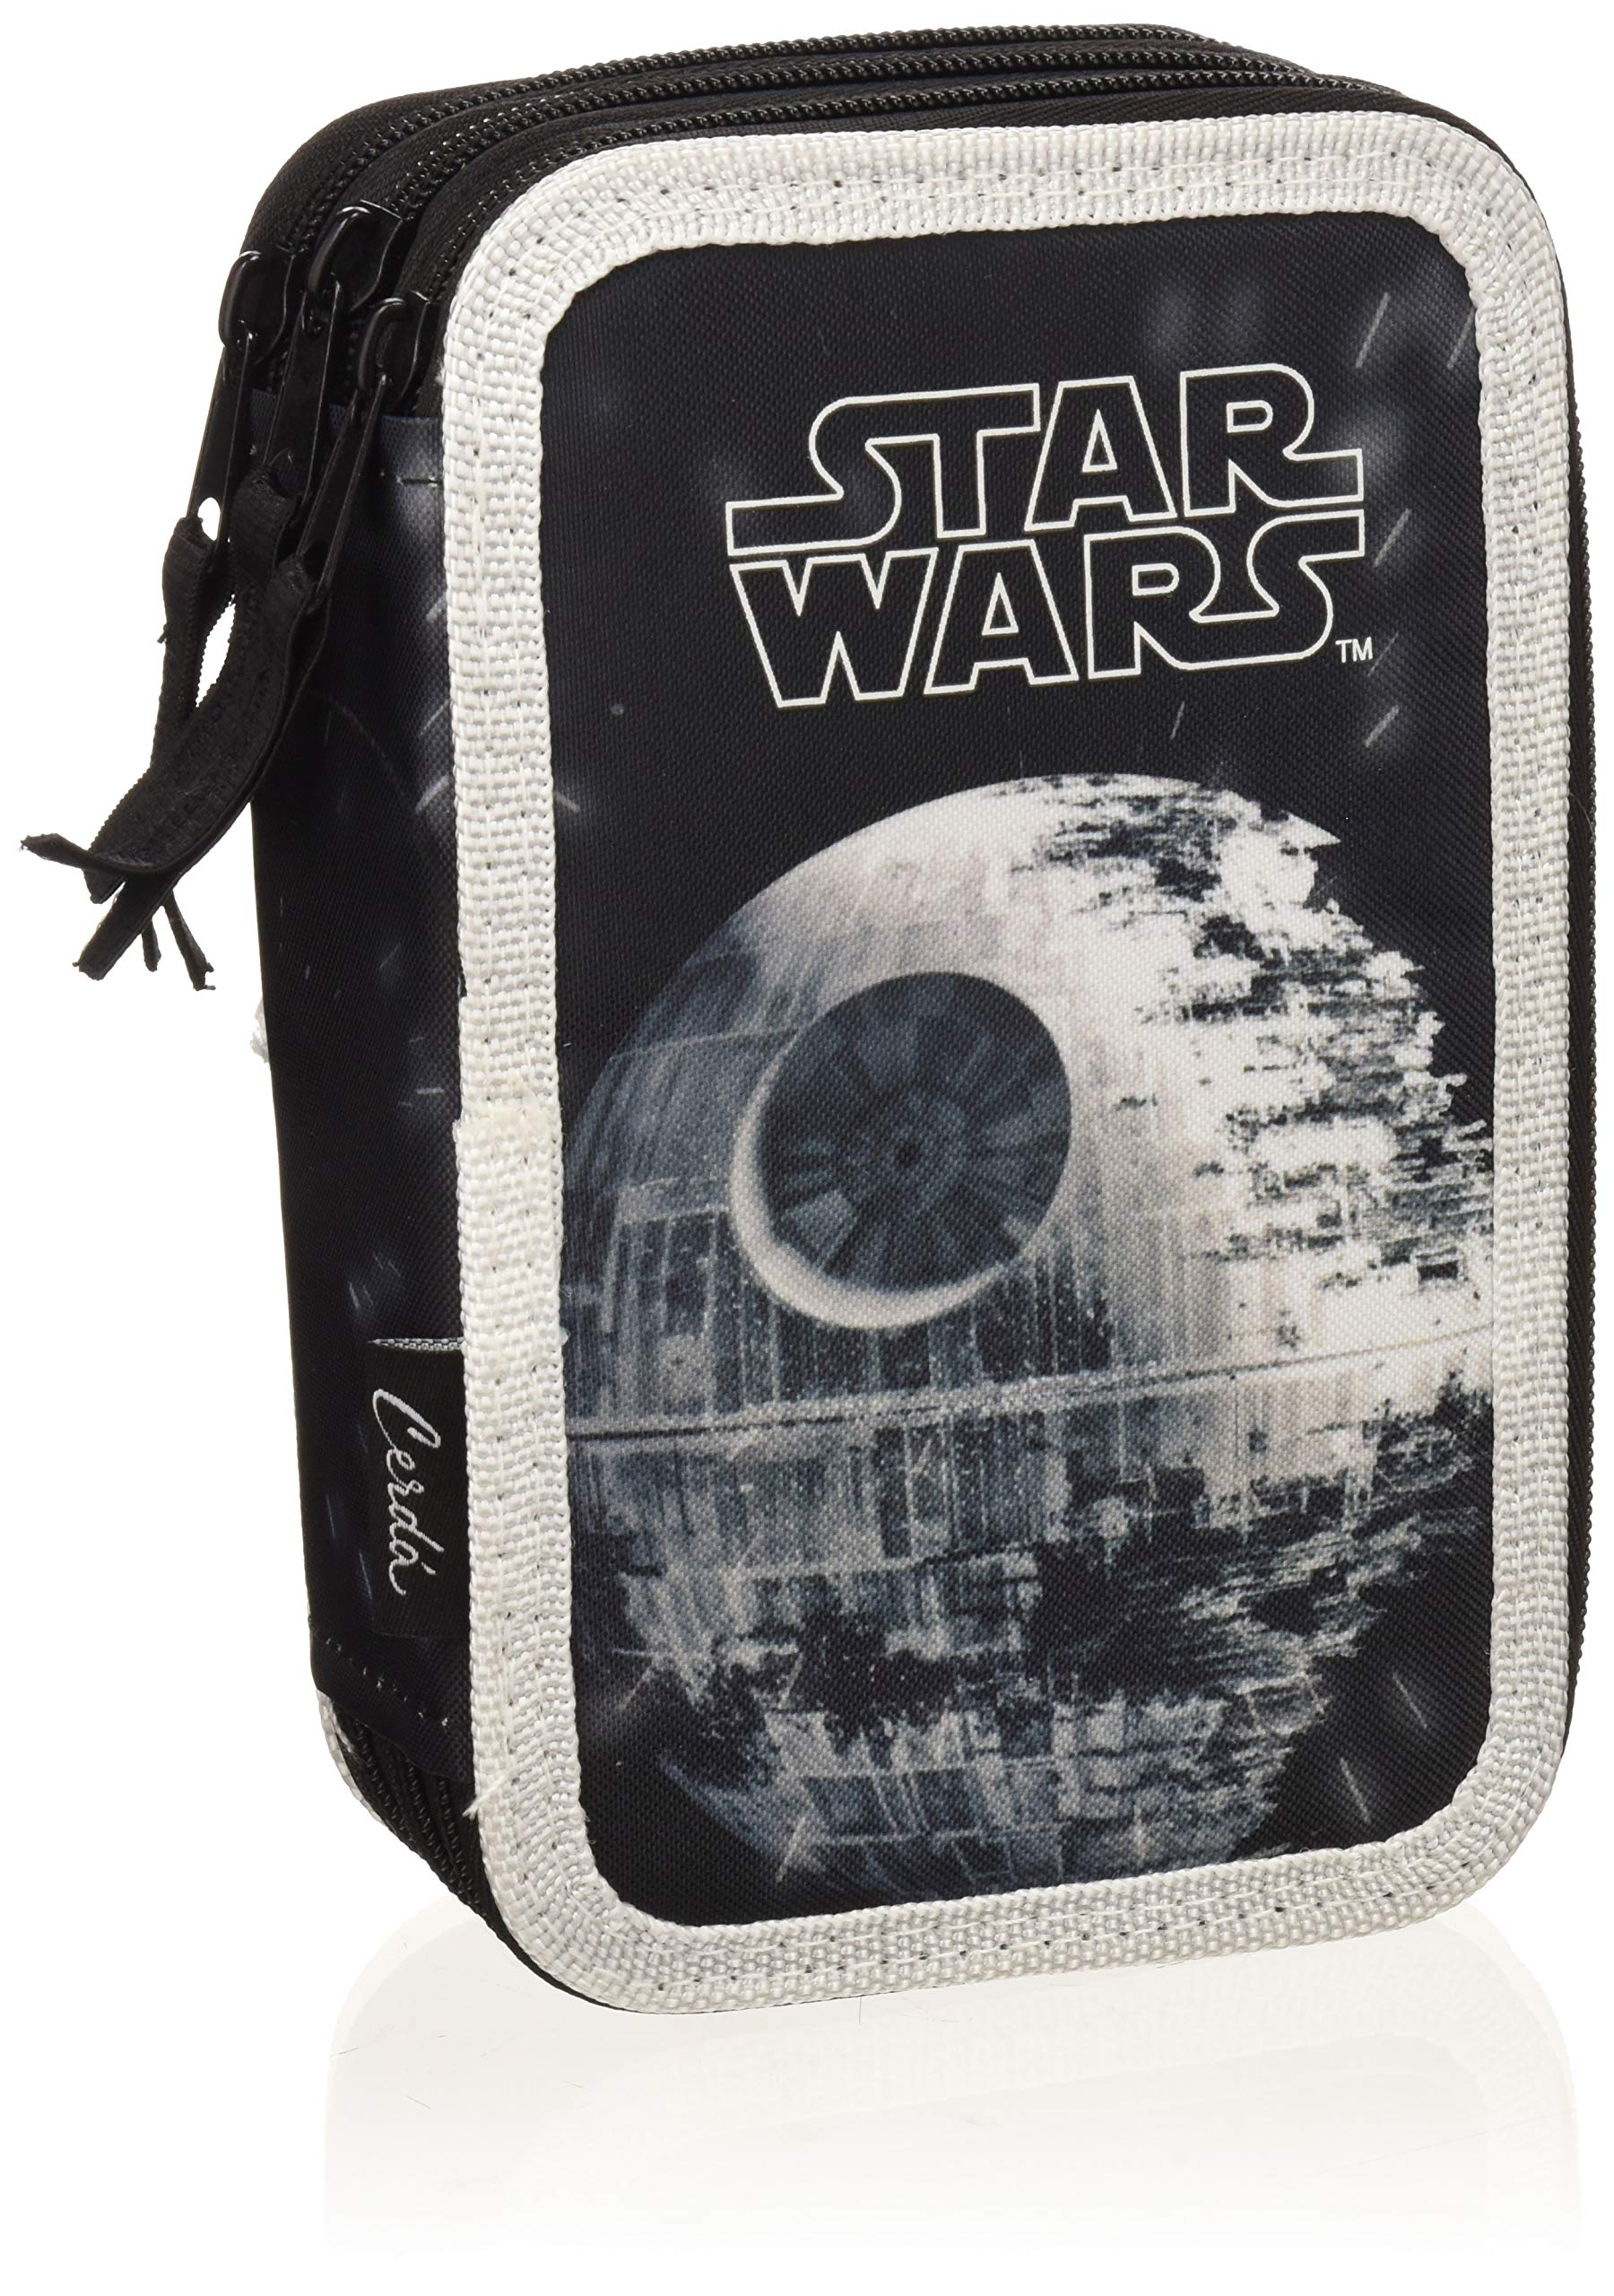 STAR WARS Star Wars-2700000223 Plumier, Multicolor, 19 cm (Artesanía Cerdá CD-27-0223)